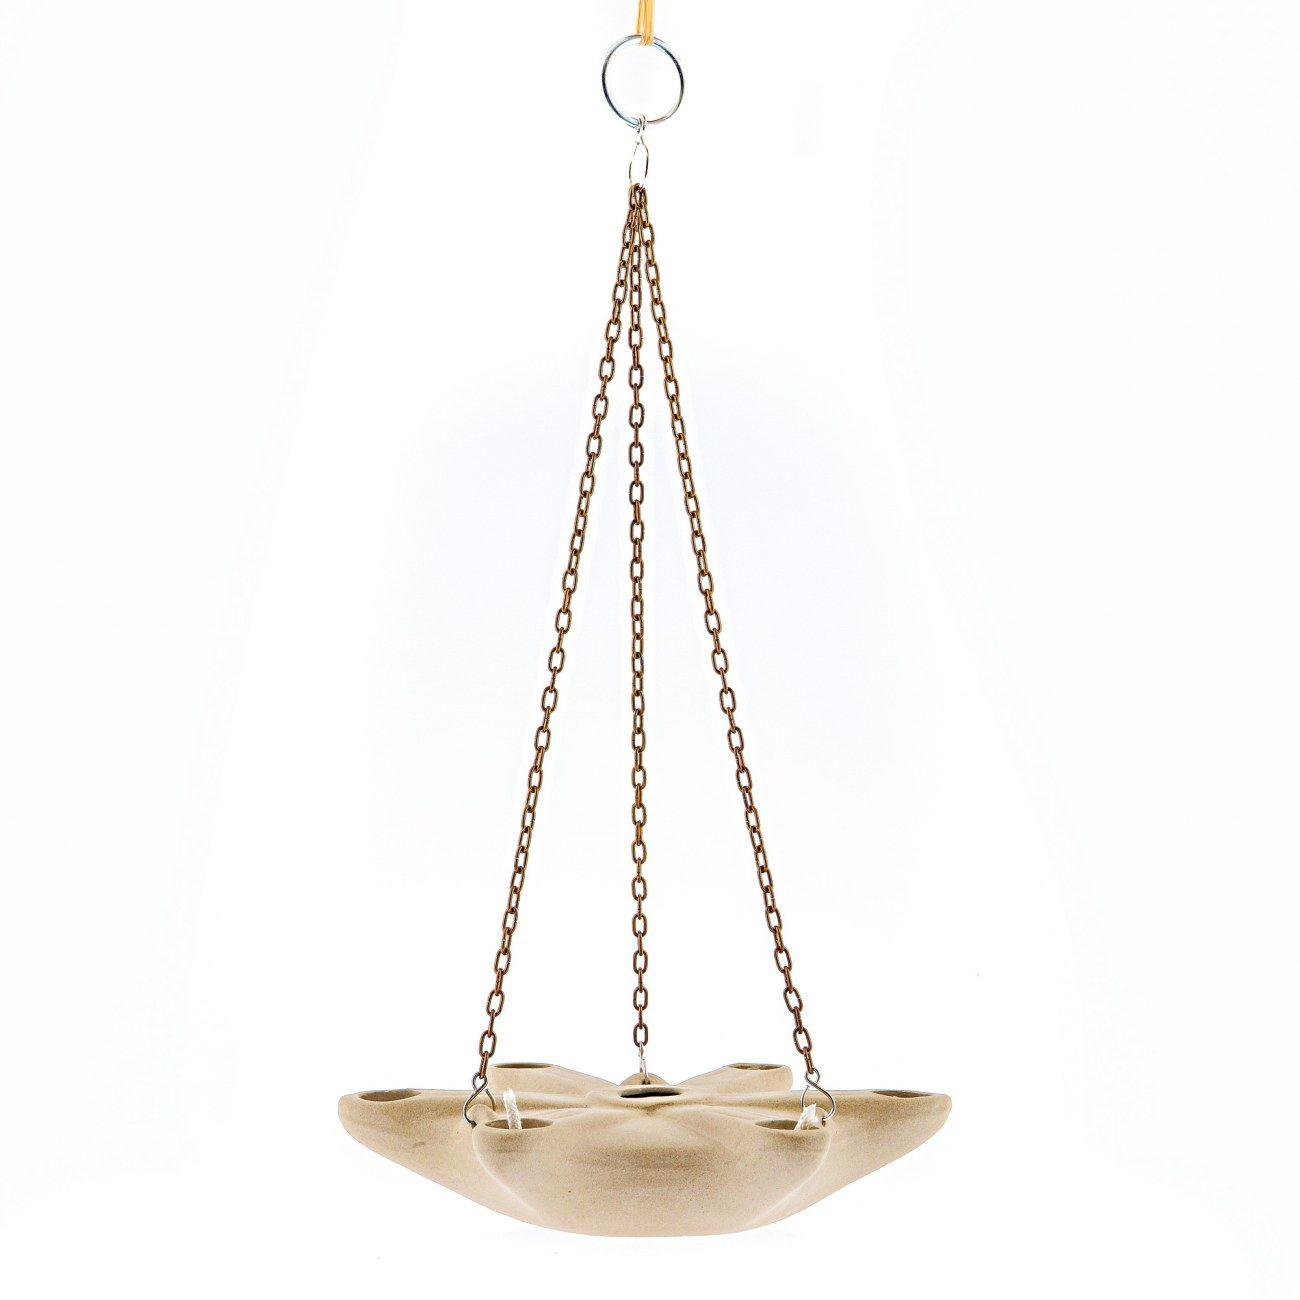 Handmade Ceramic Oil Lamps : Oil lamp handmade quality ceramic ancient greek style